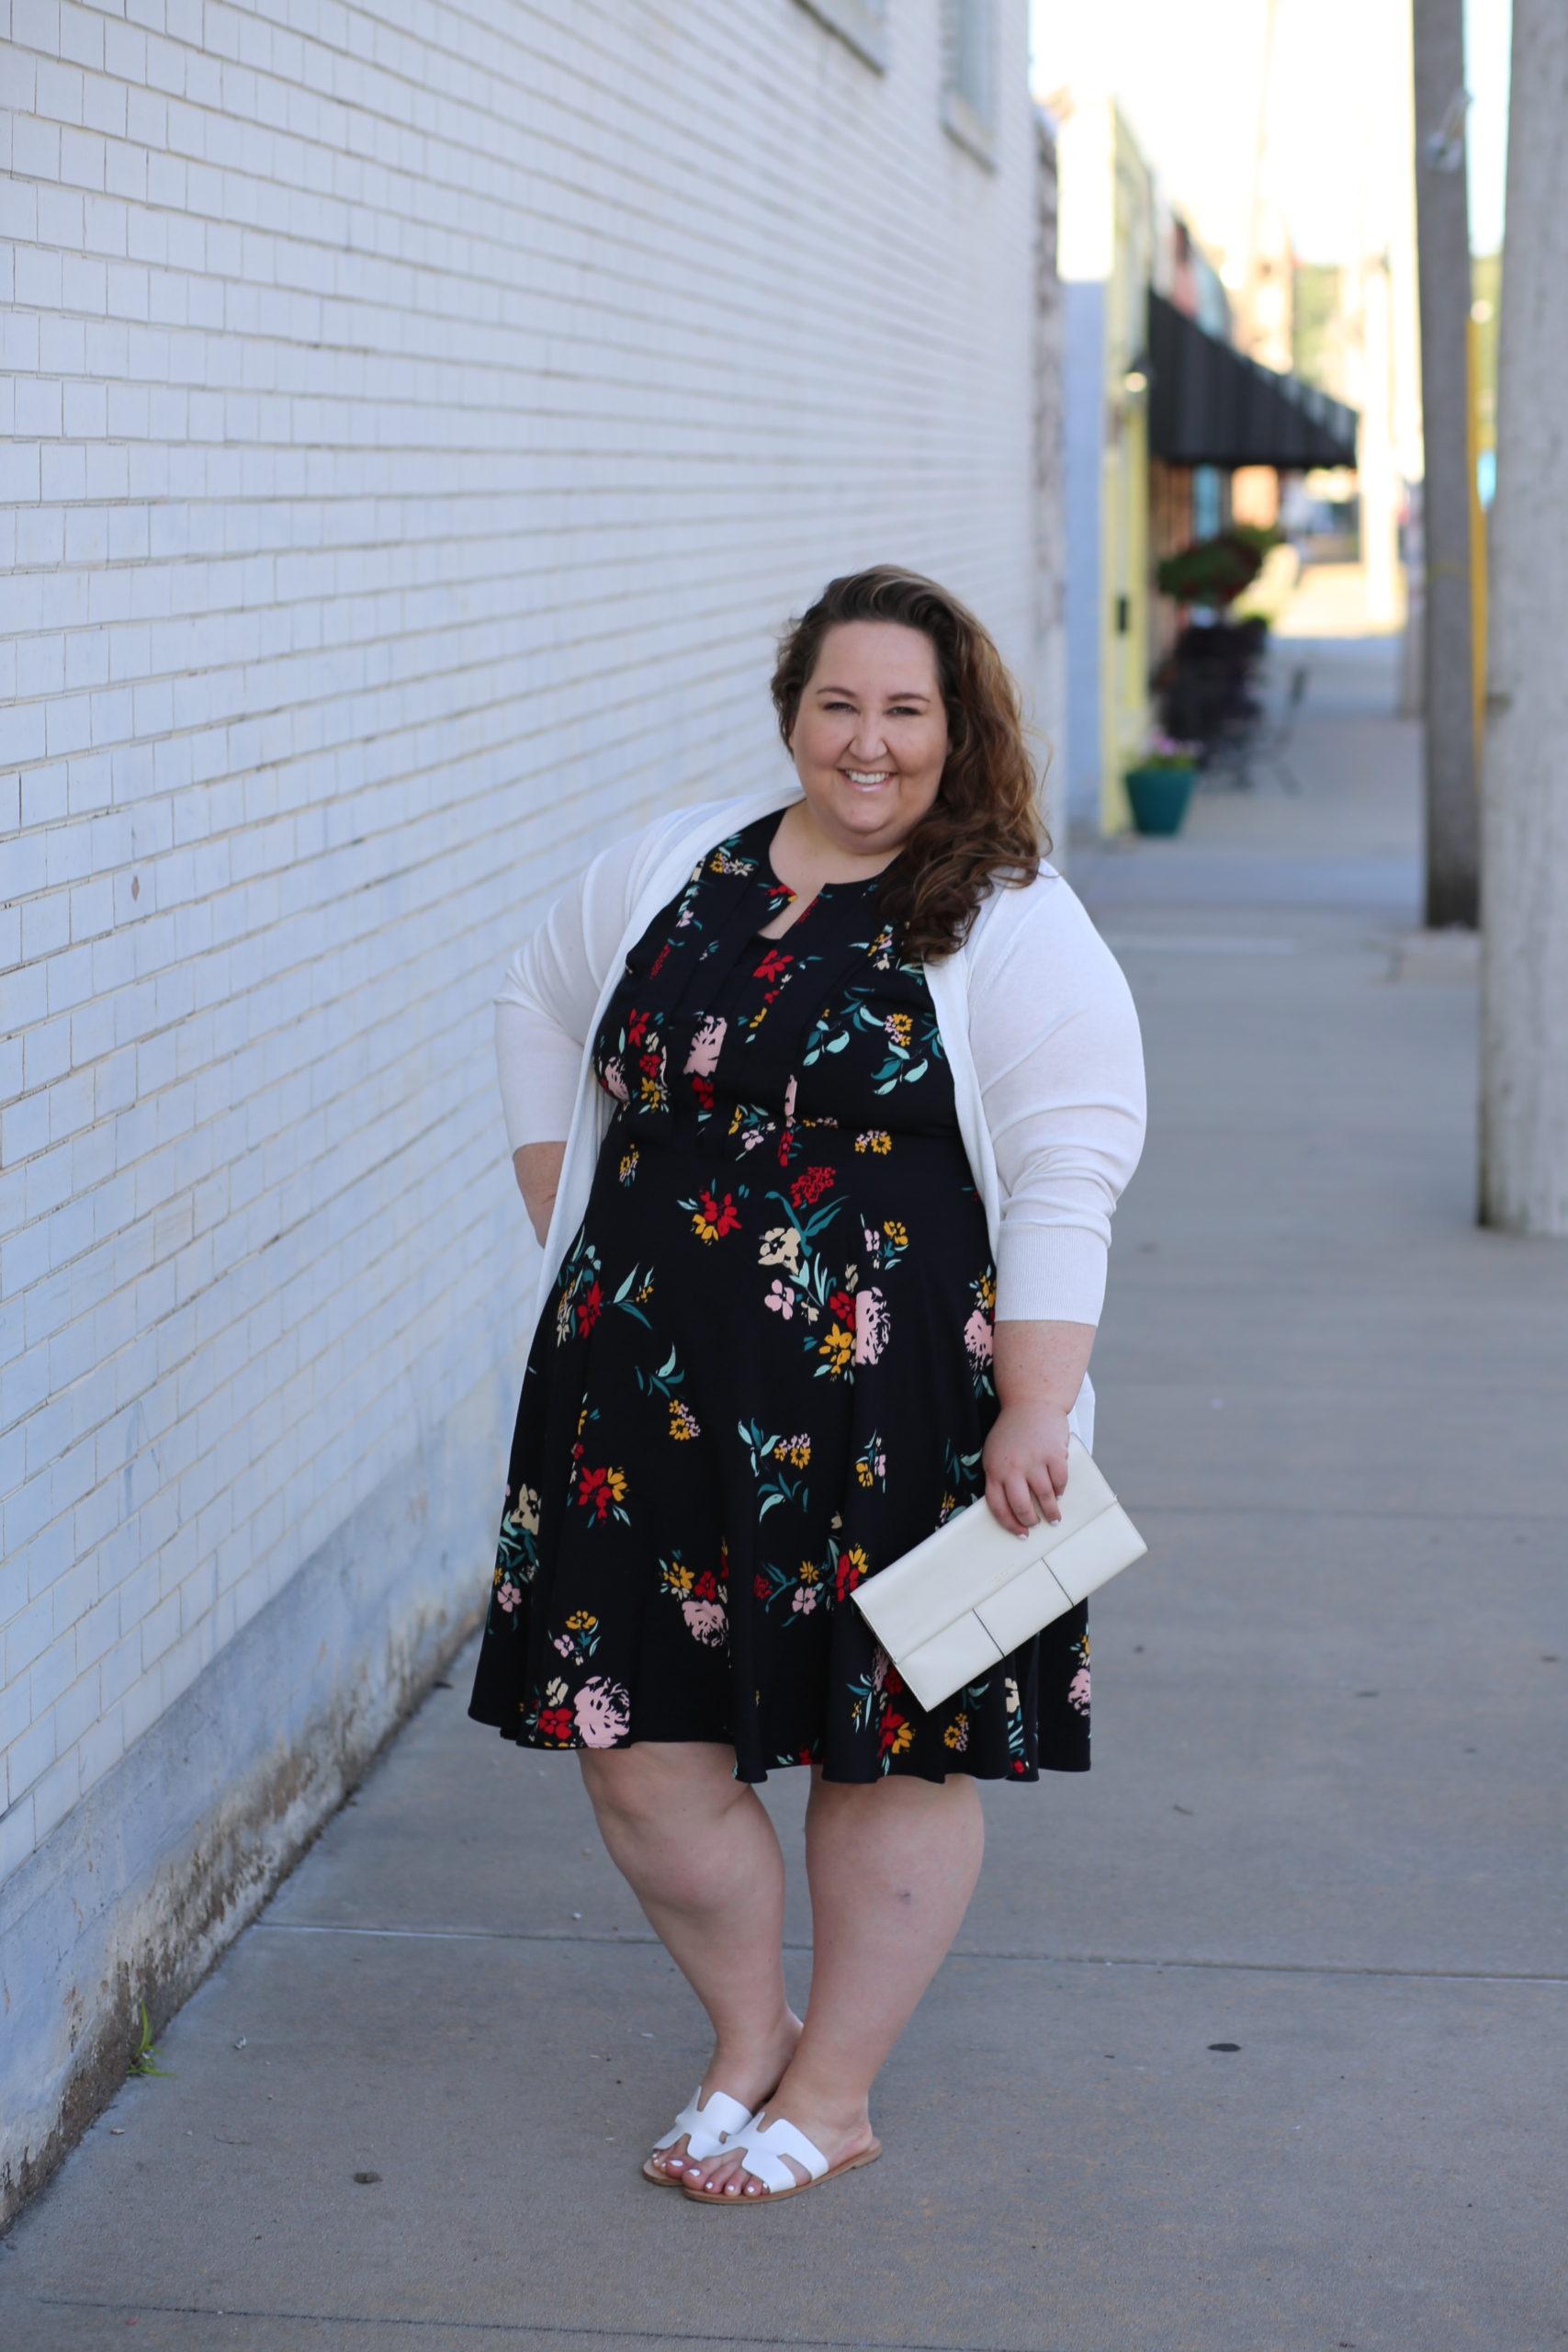 floral dress, plus size style, white cardigan, white clutch, white sandals, dia & co.